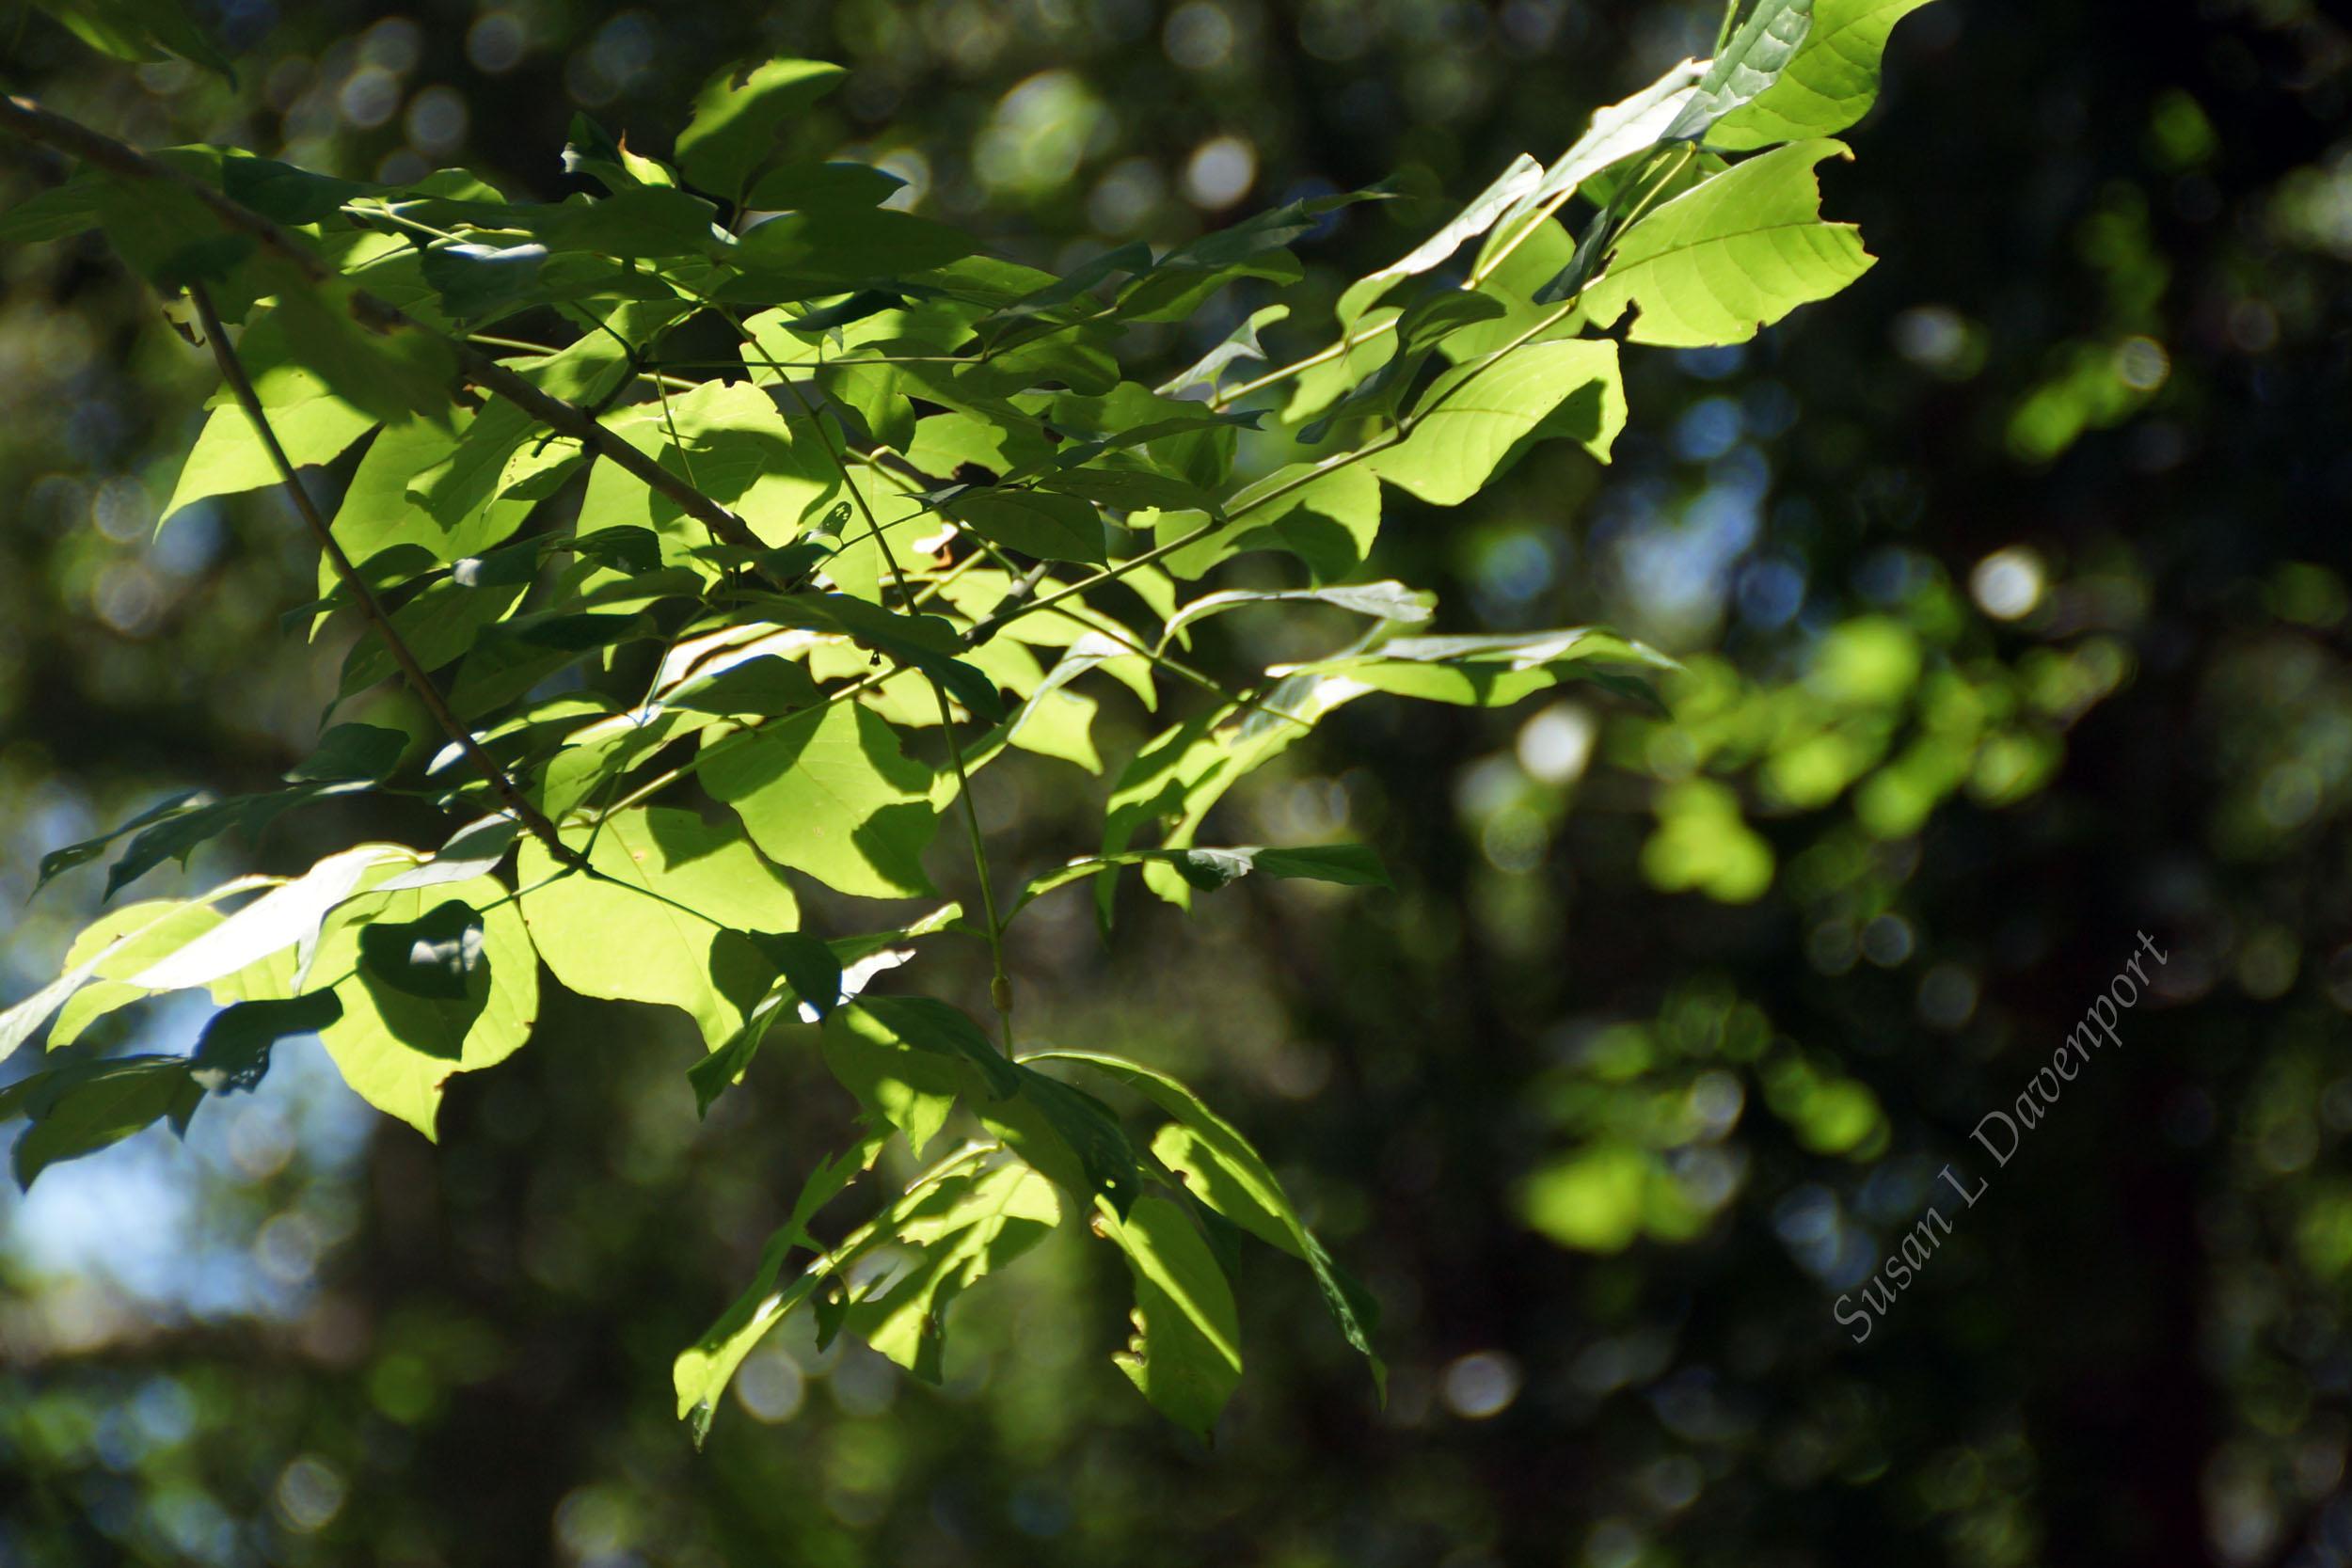 My Backyard: Sun in the leaves